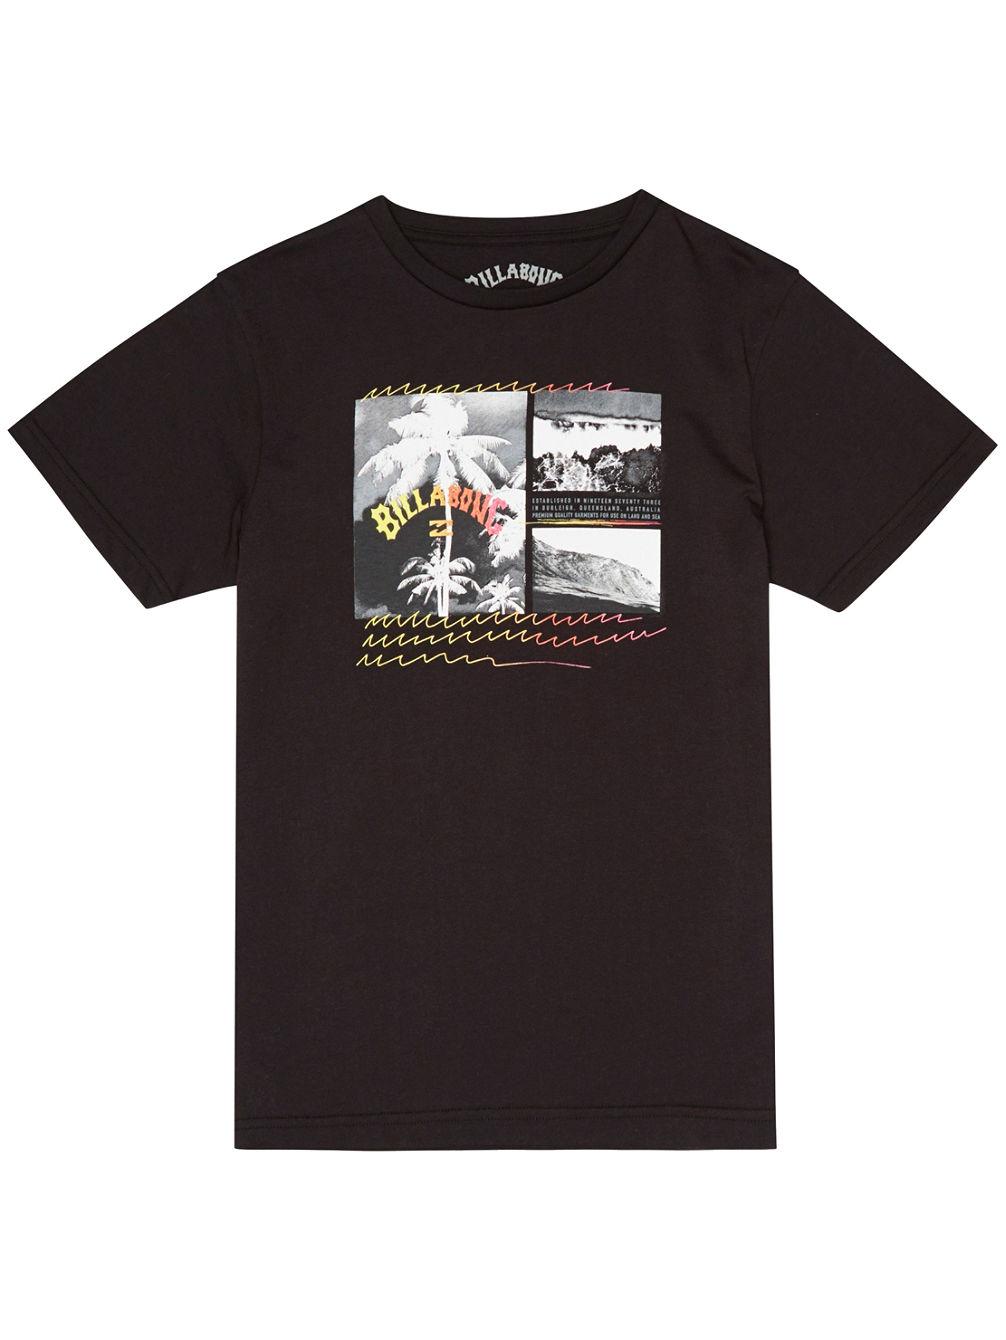 Achat Billabong Crash T-shirt En Ligne